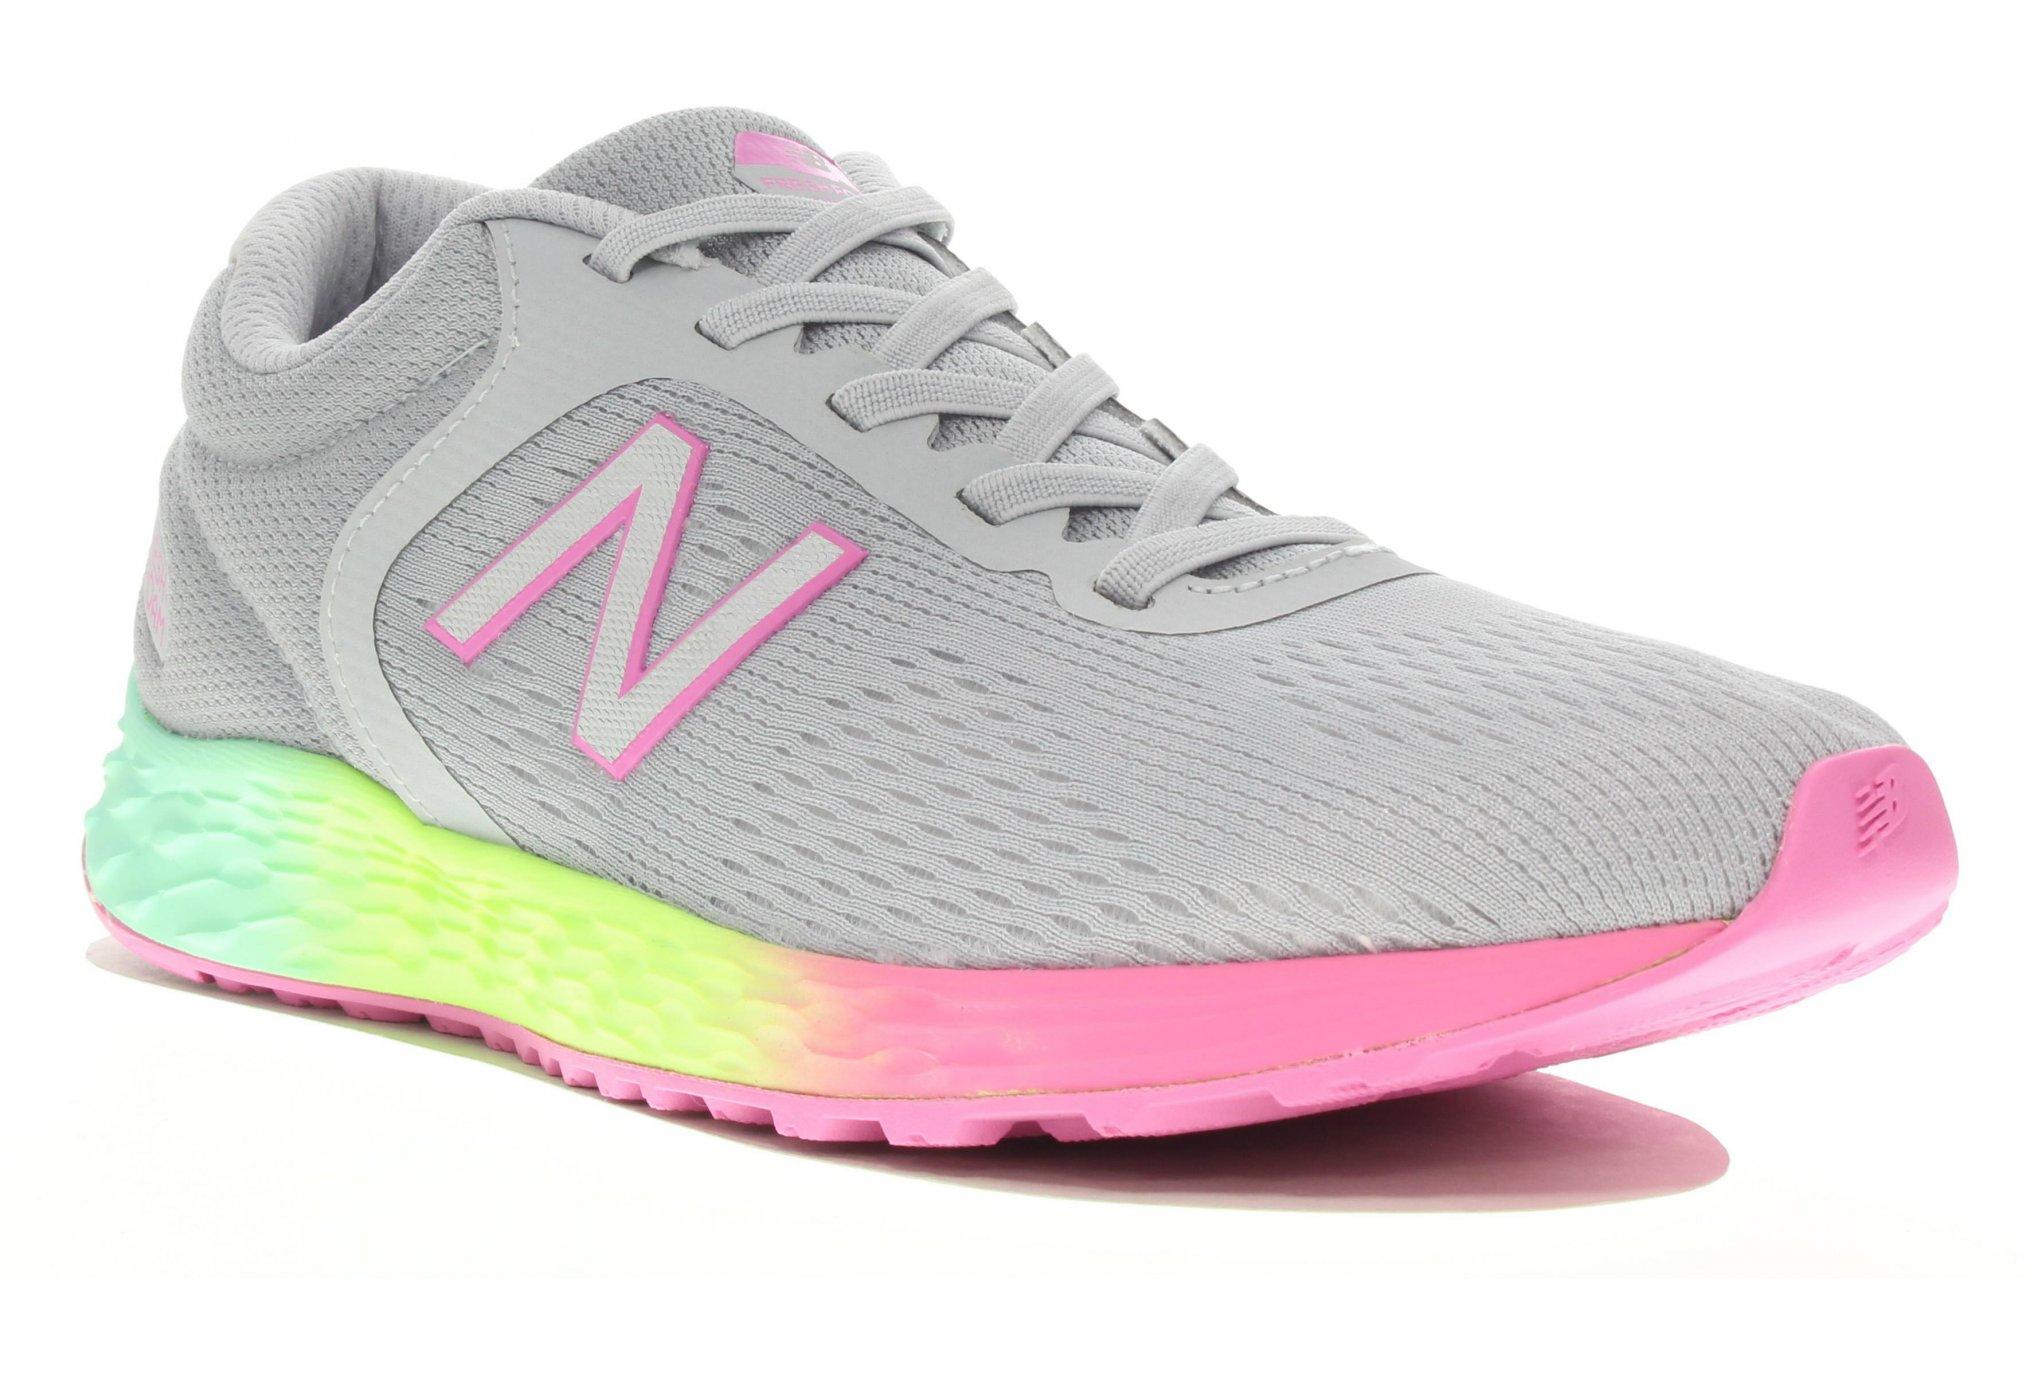 New Balance Arishi Fille Chaussures running femme